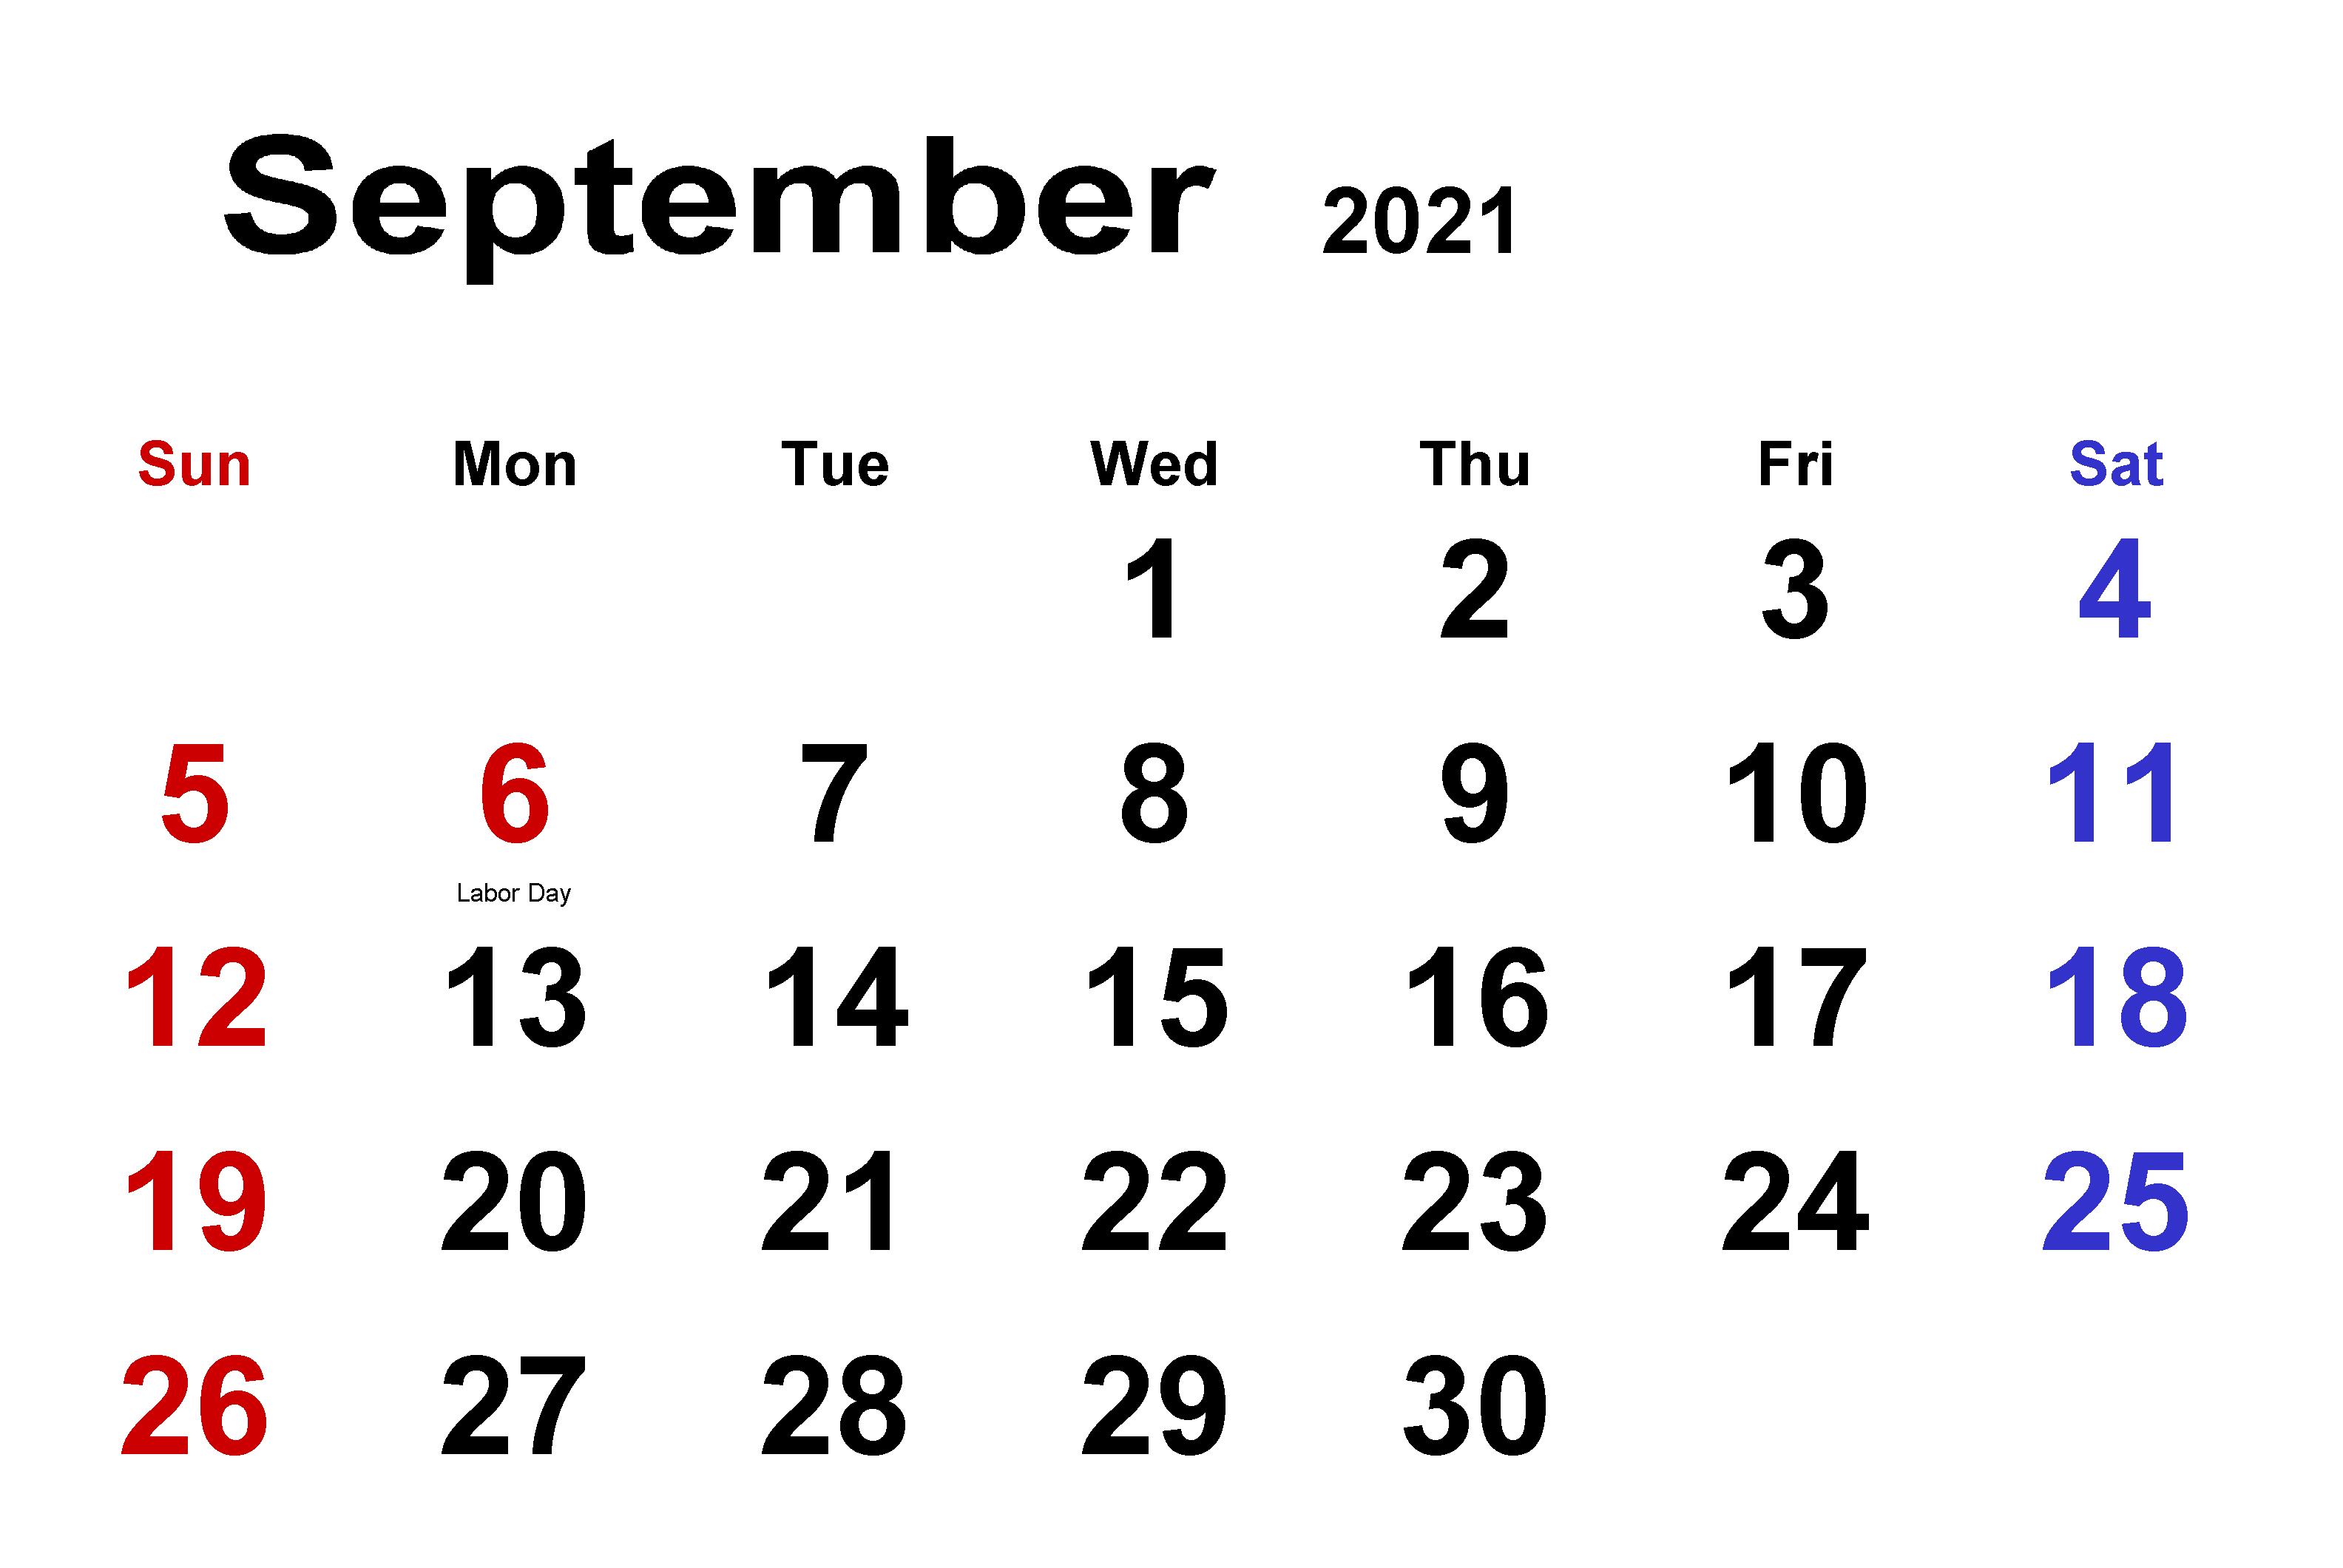 Daily September 2021 Calendar download